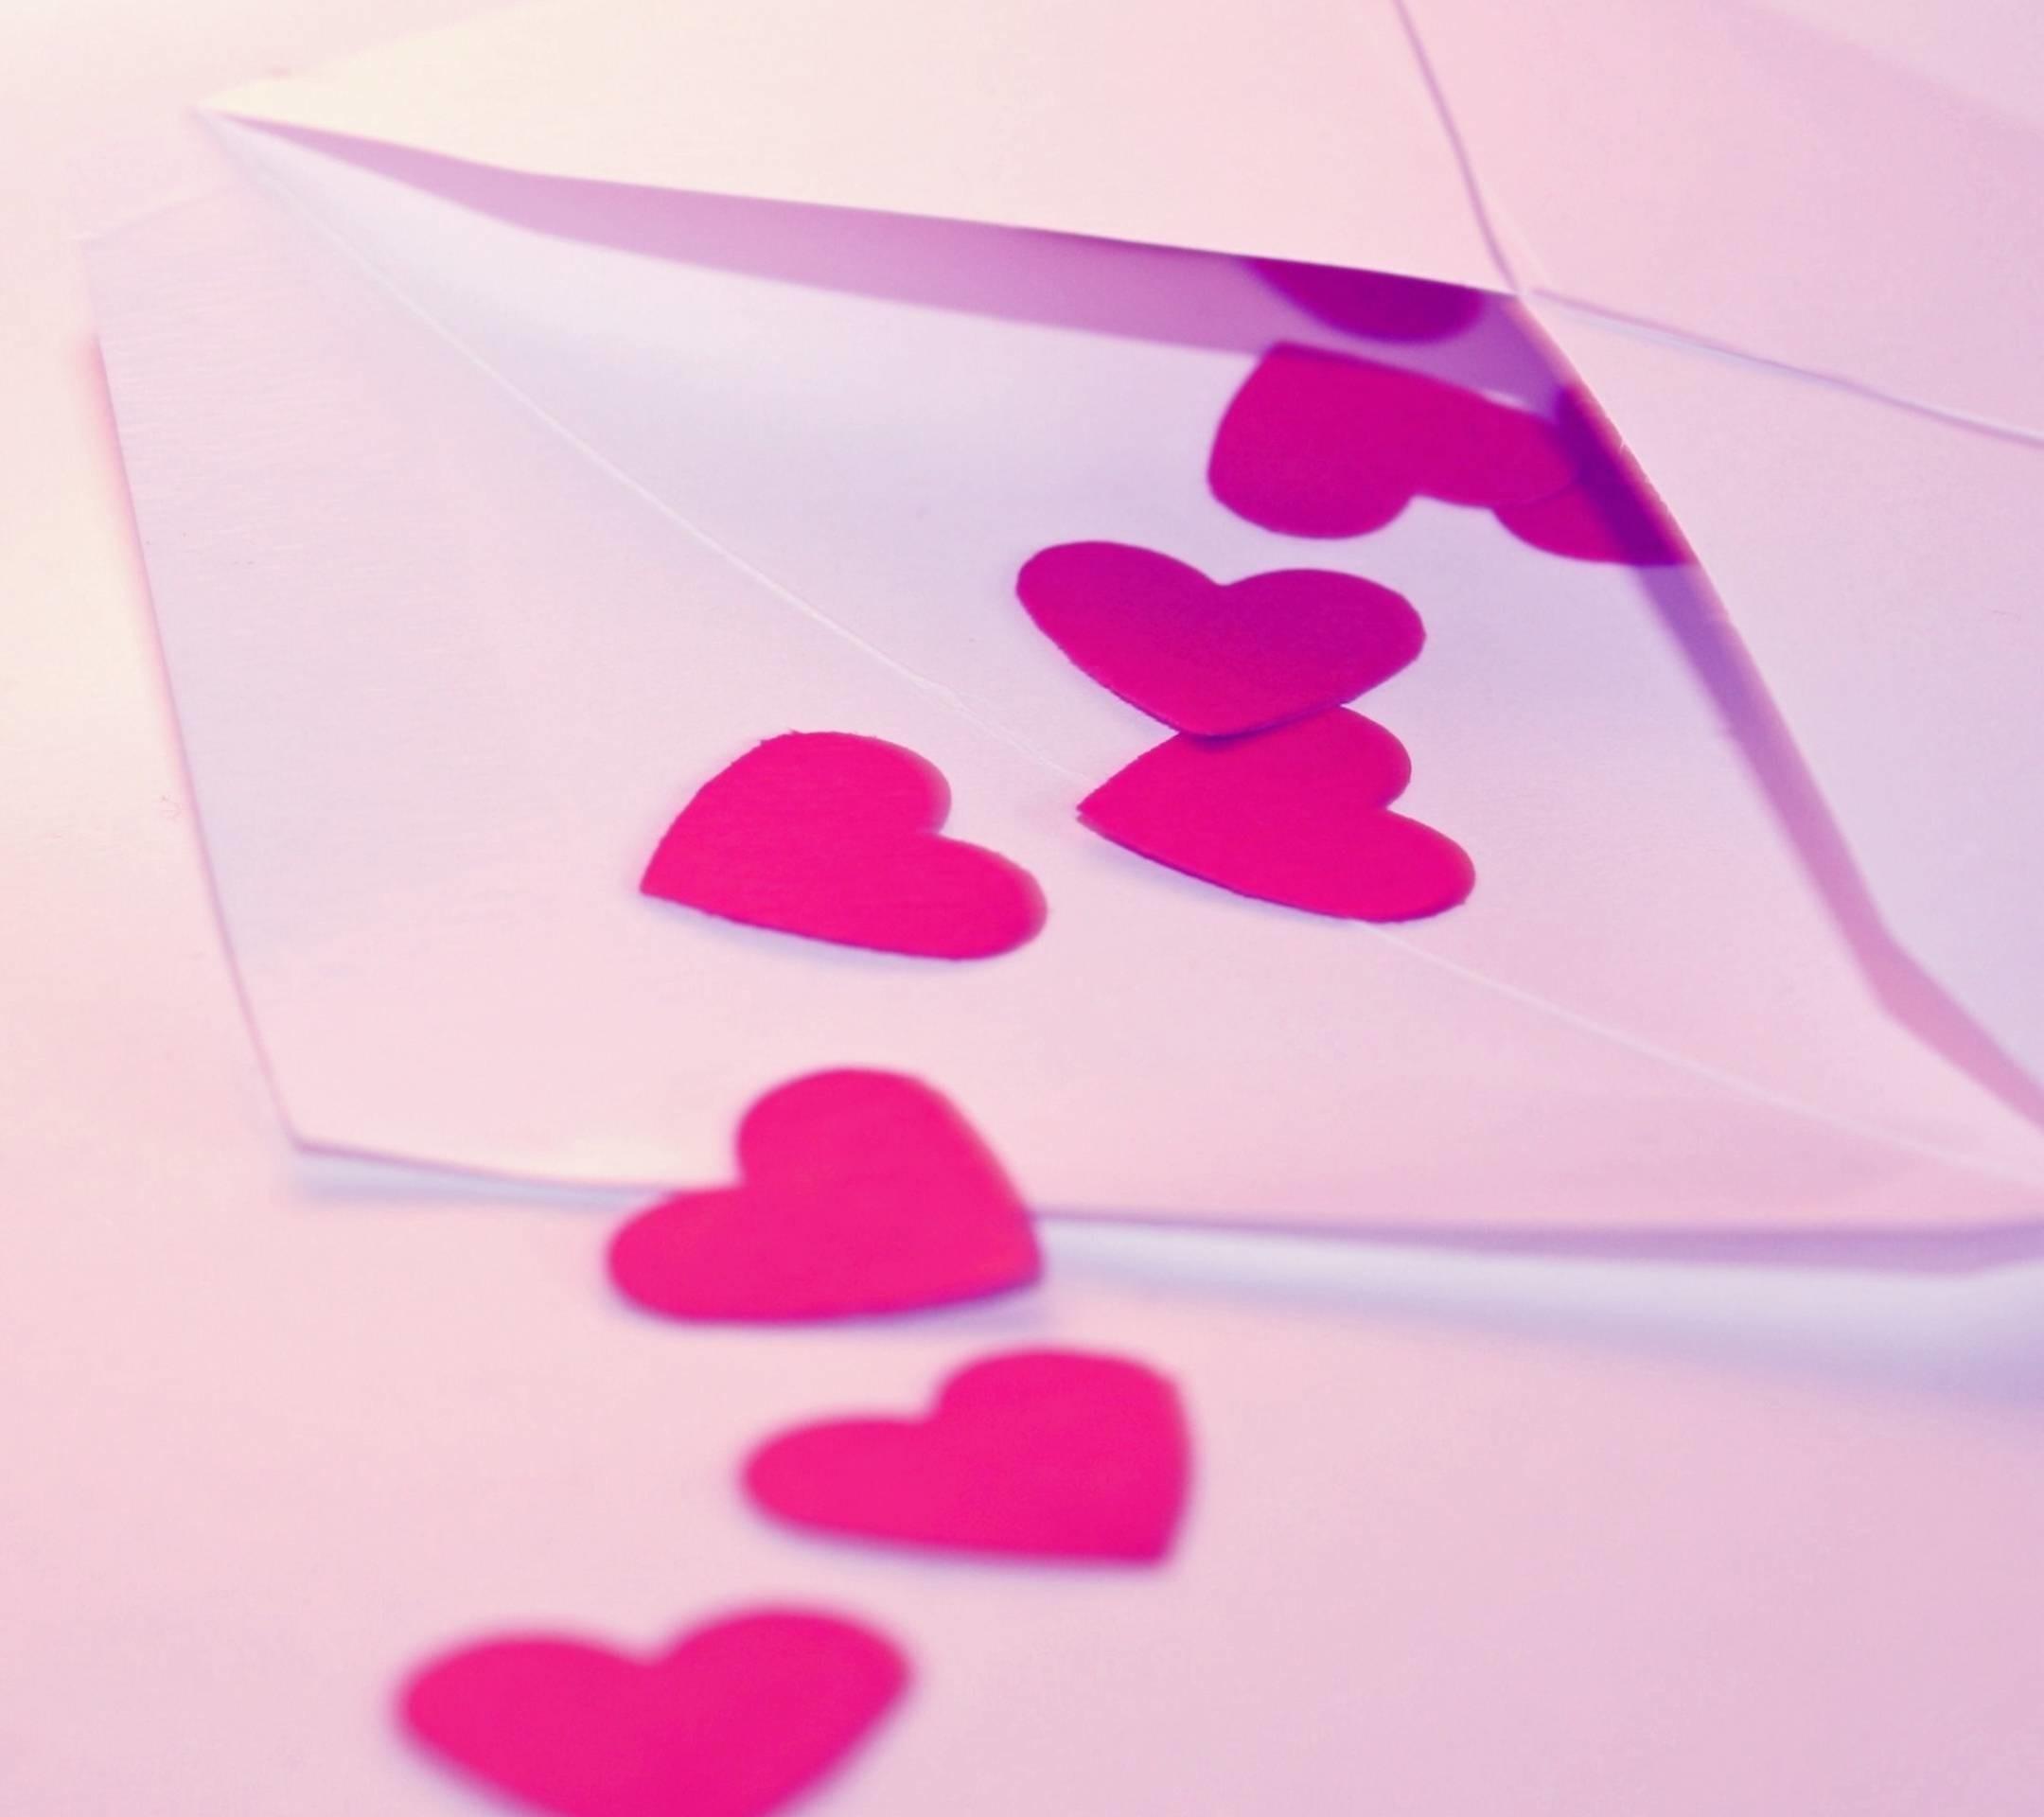 Pink Hearts Wallpapers, wallpaper, Pink Hearts Wallpapers hd .